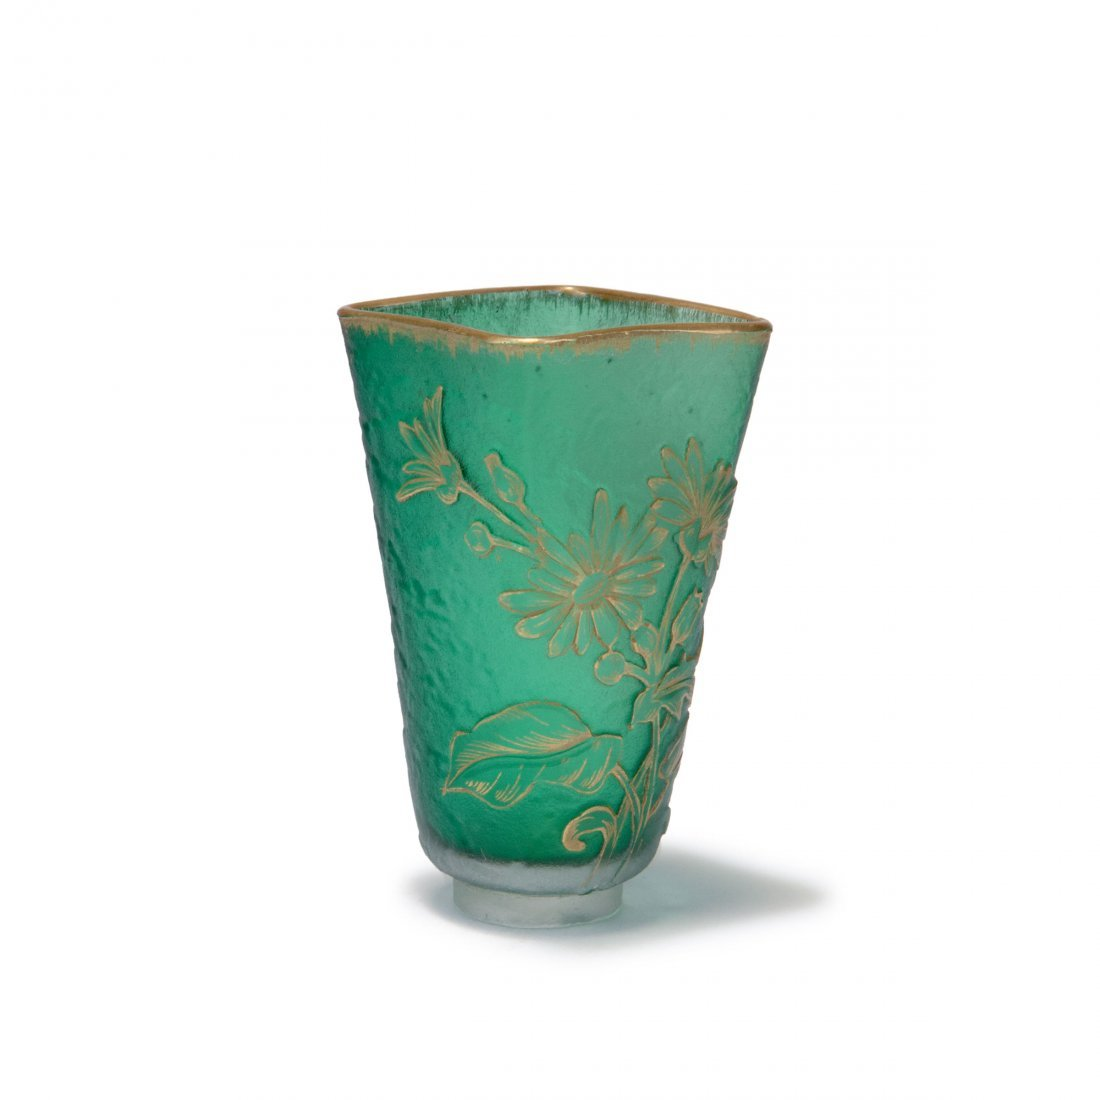 'Paquerettes' mug, c1893